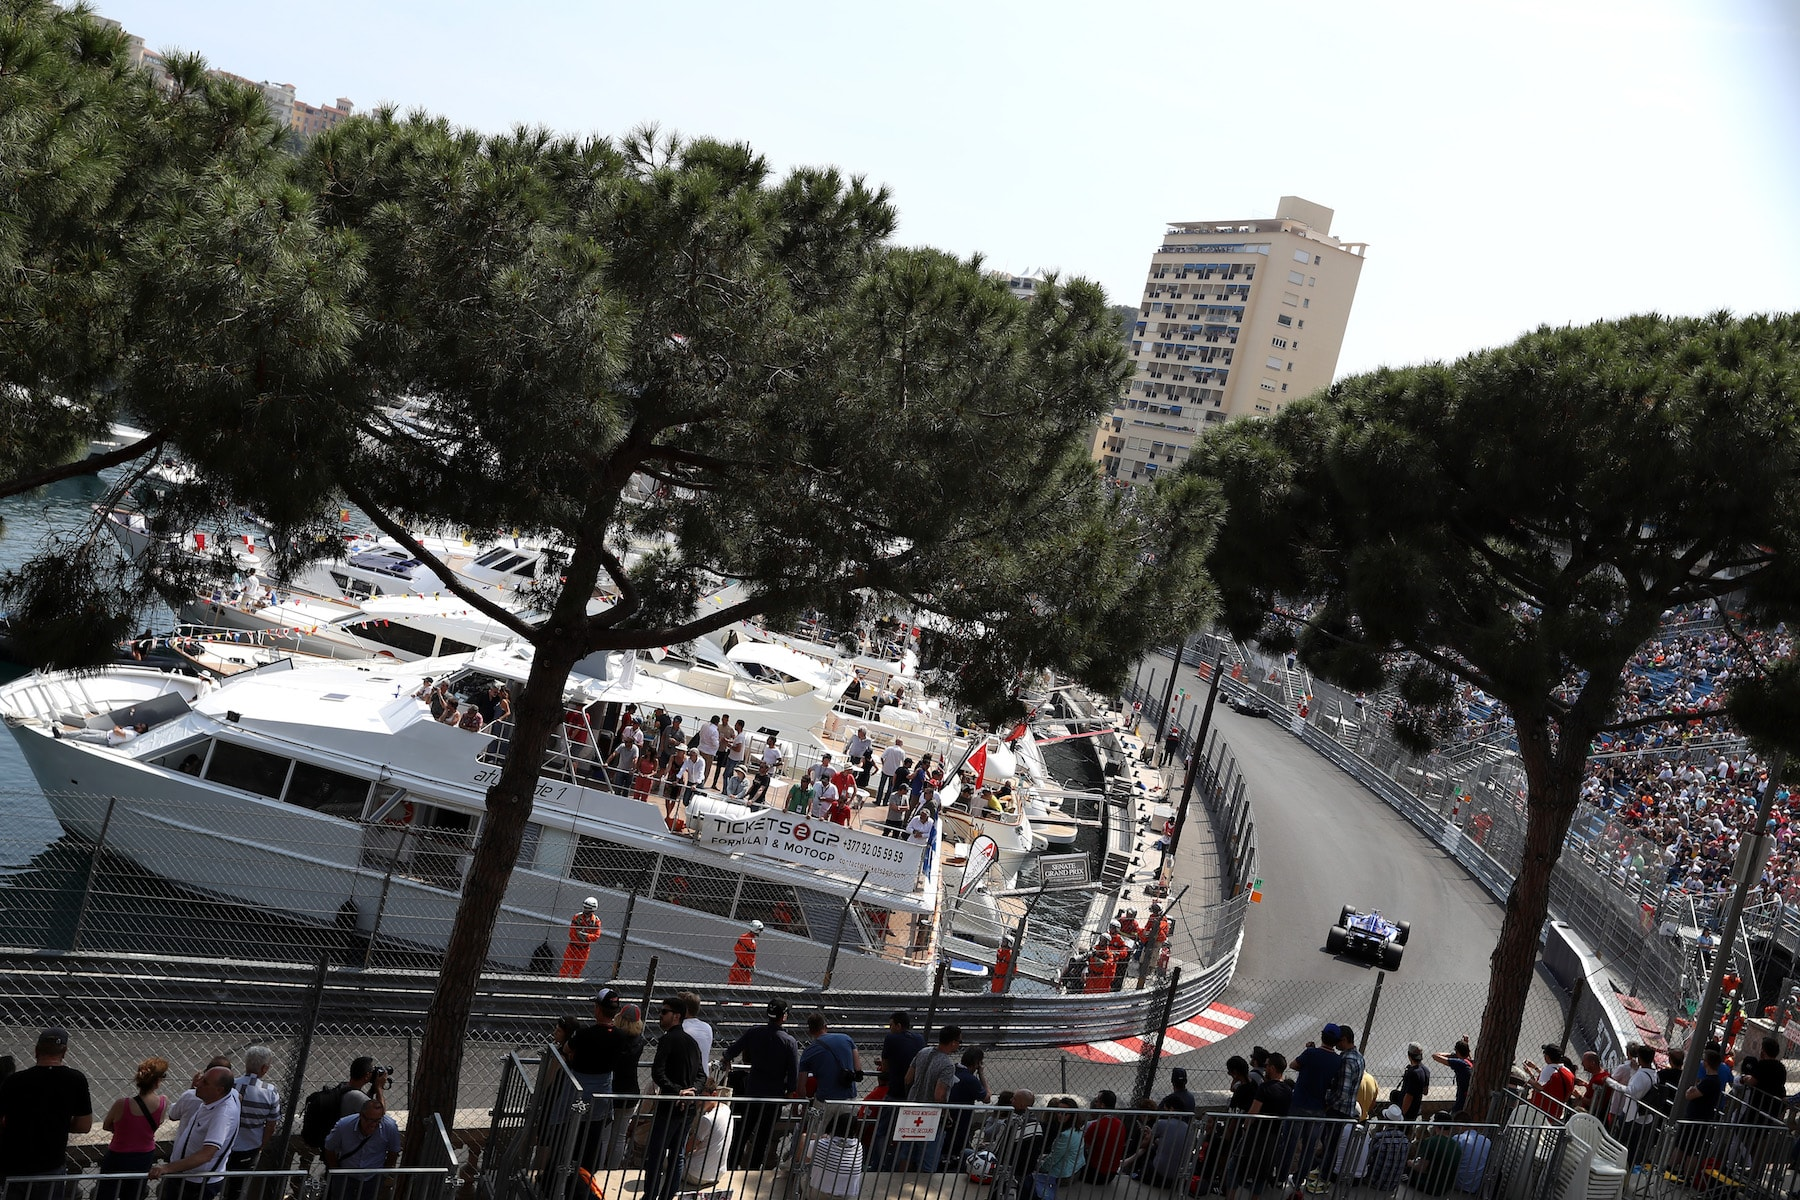 2017 Marcus Ericsson | Sauber C36 | 2017 Monaco GP FP2 3 copy.jpg